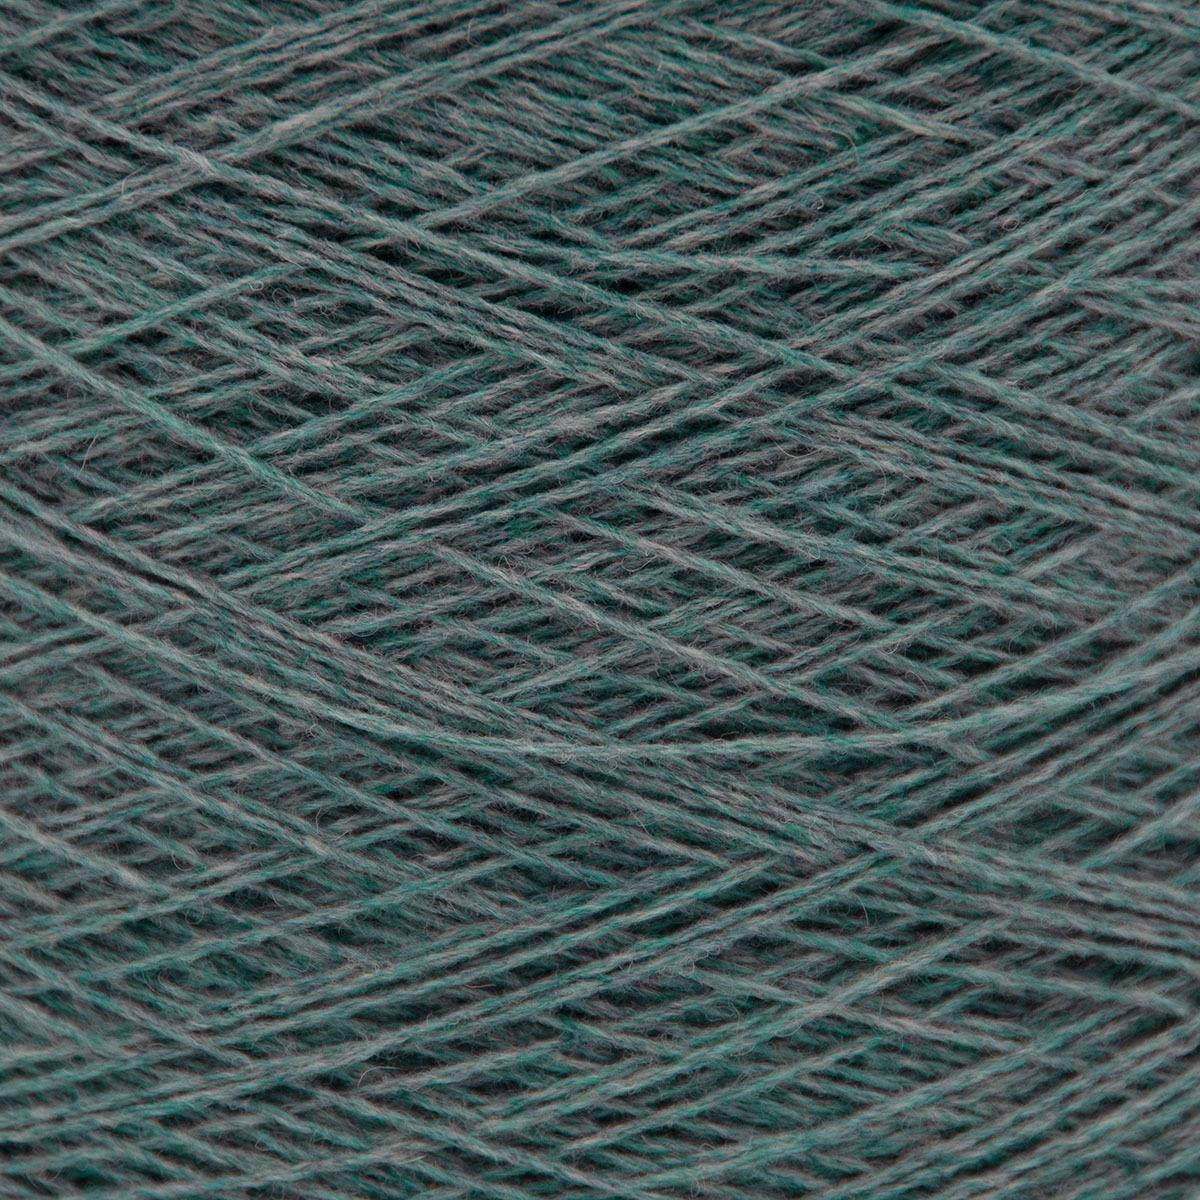 Knoll Yarns Merino Lambswool - 143